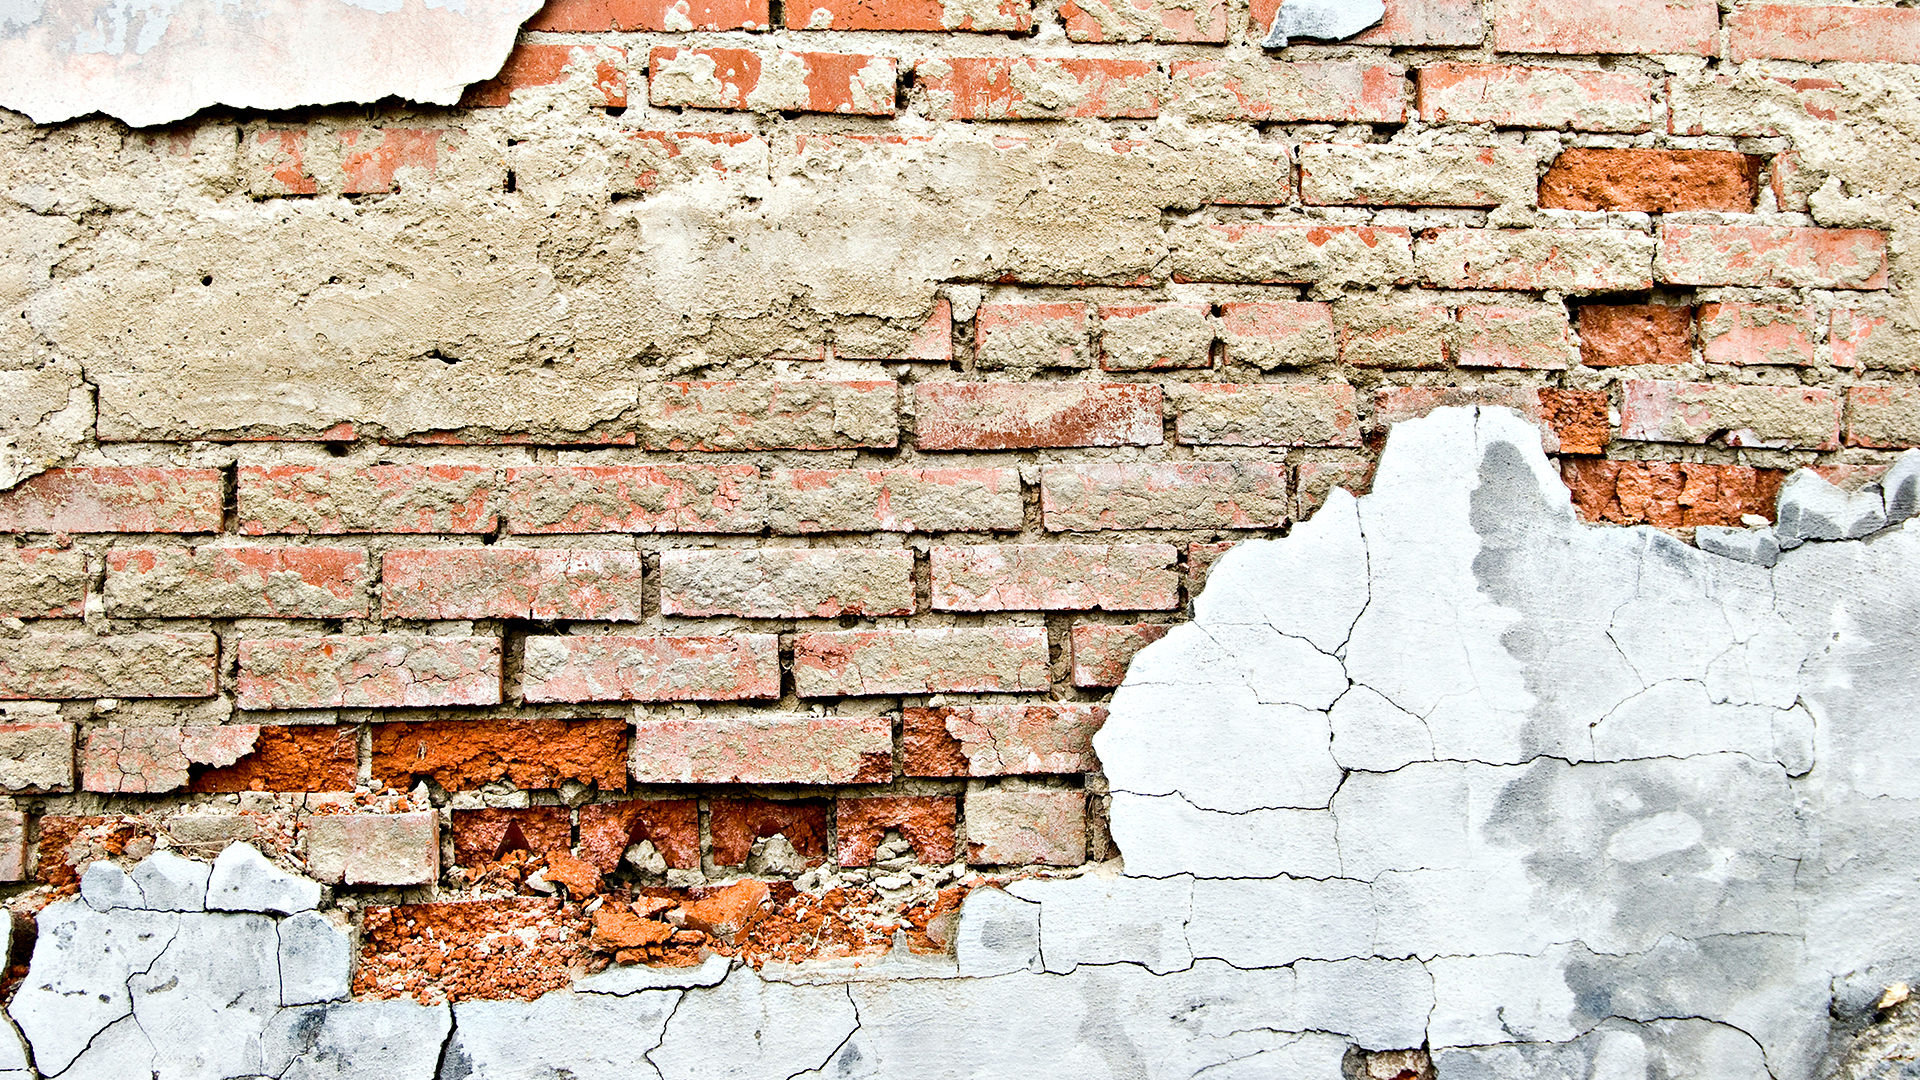 old brick wall, bricks, background, texture, download photo, stucco